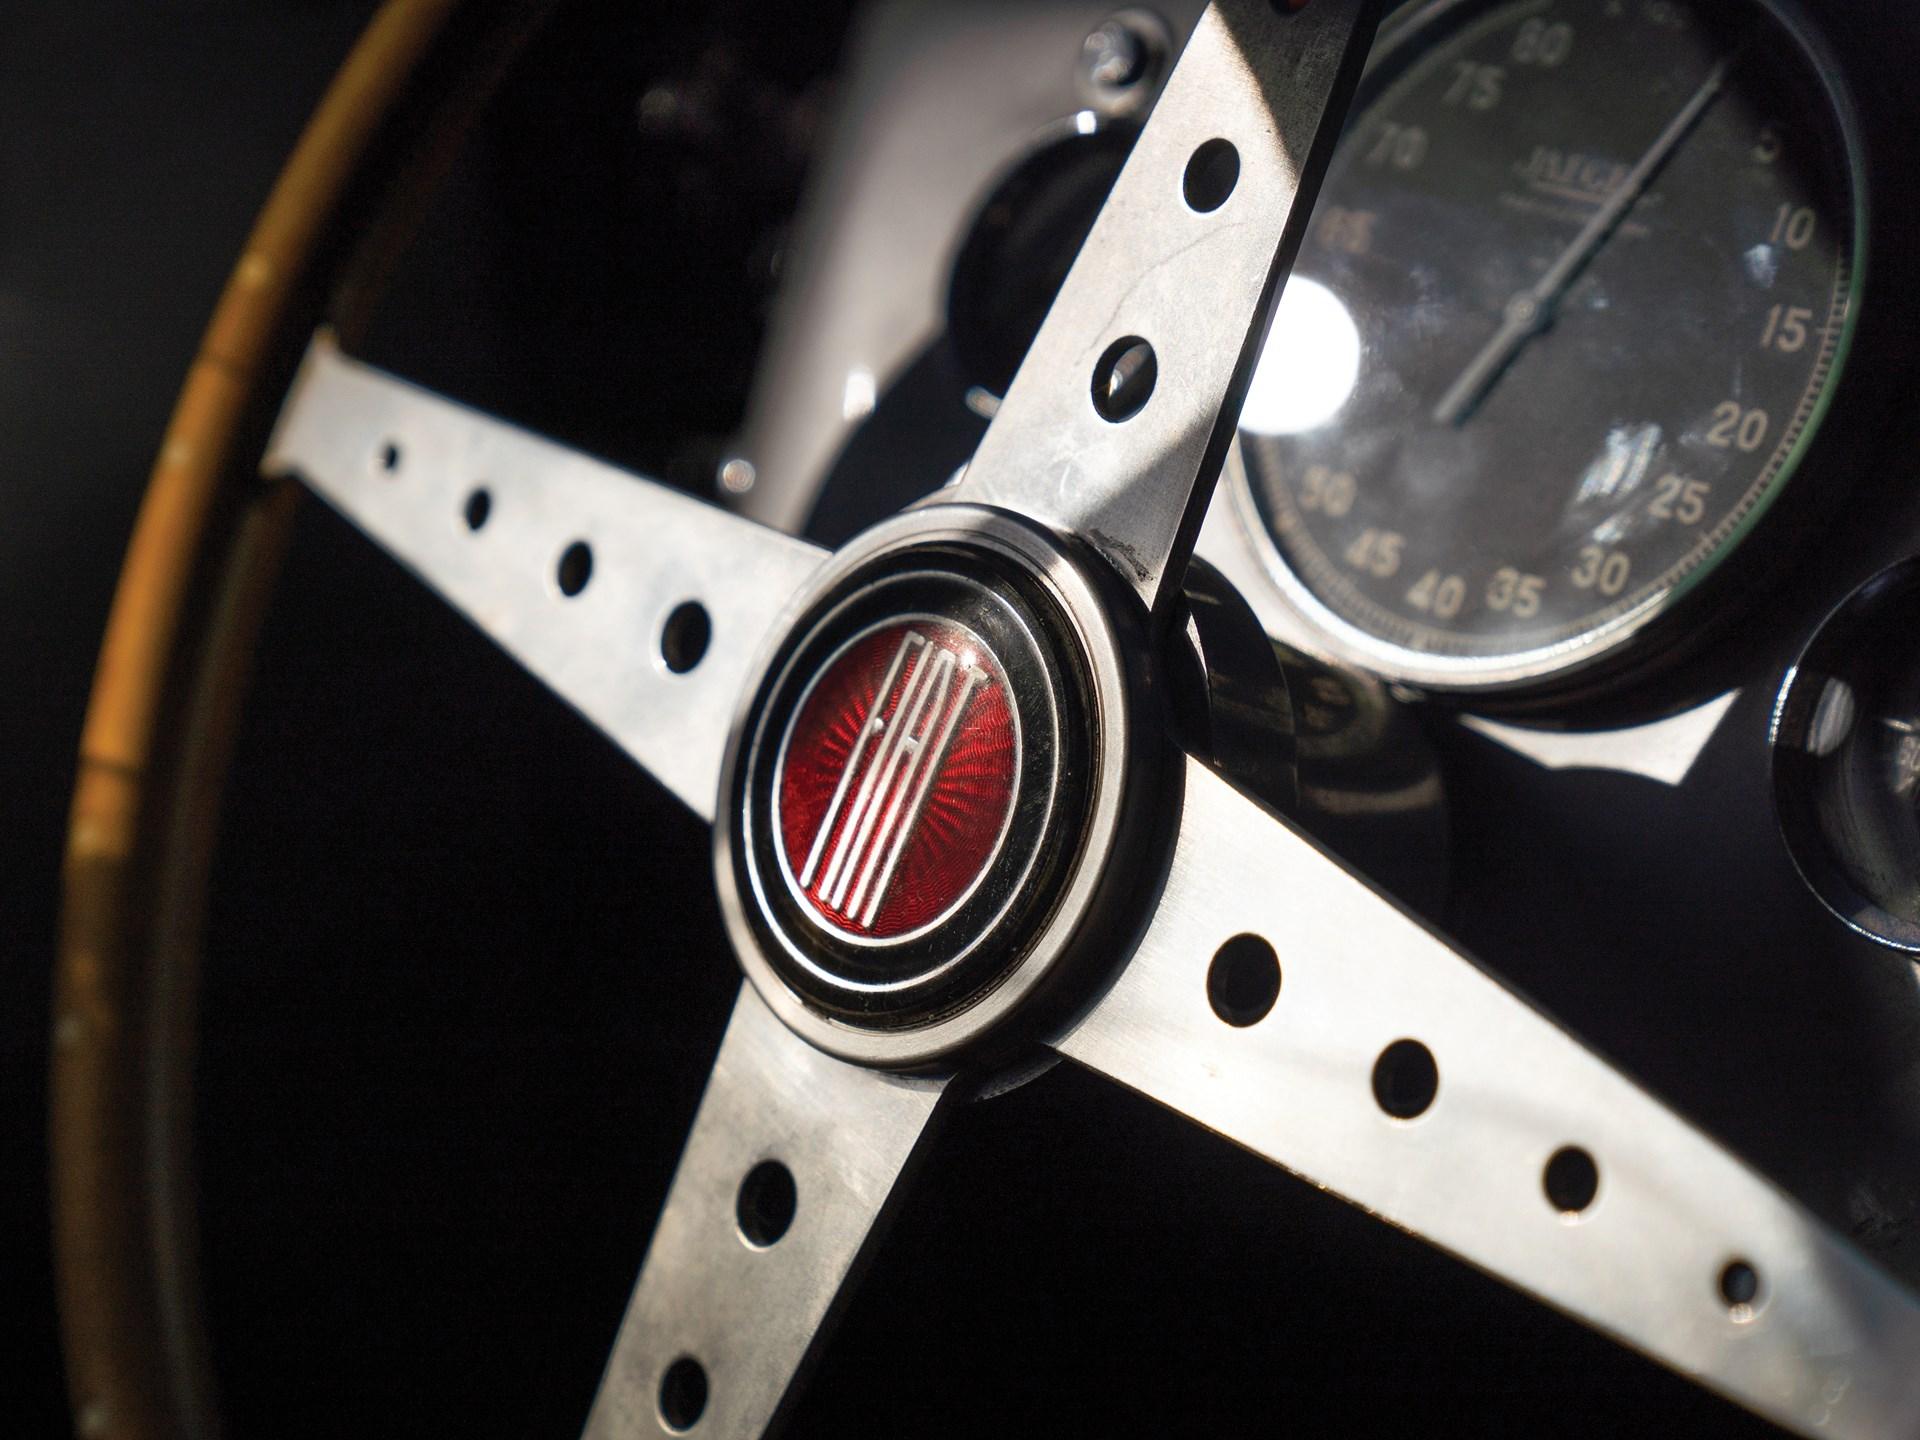 1949 Fiat-Patriarca 750 Berlinetta Sport by Faina